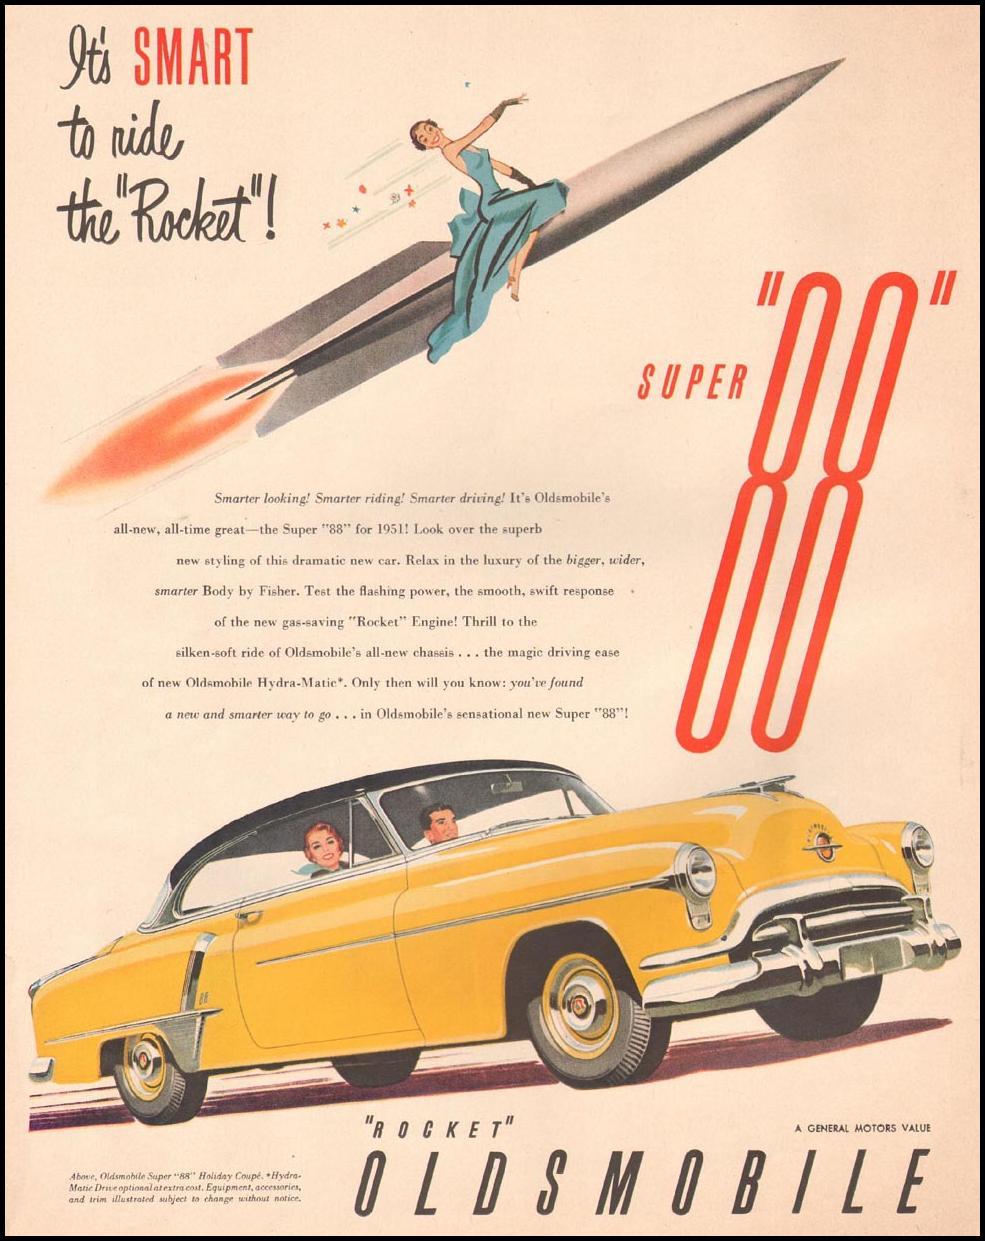 OLDSMOBILE AUTOMOBILES LIFE 07/02/1951 p. 54